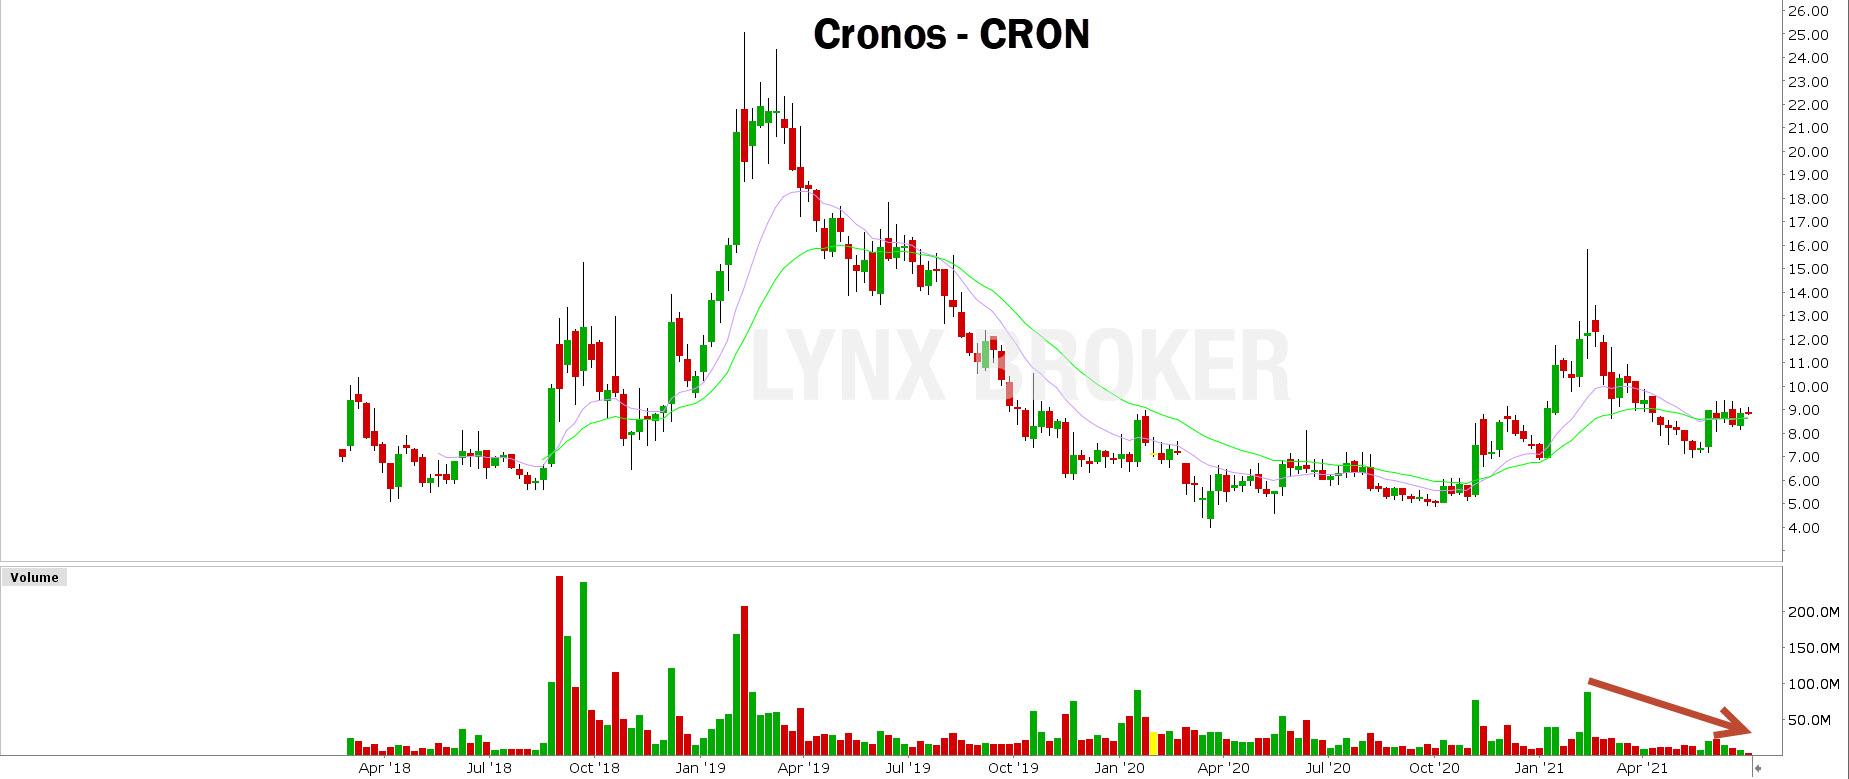 volume actions - volume trading - graphique Cronos